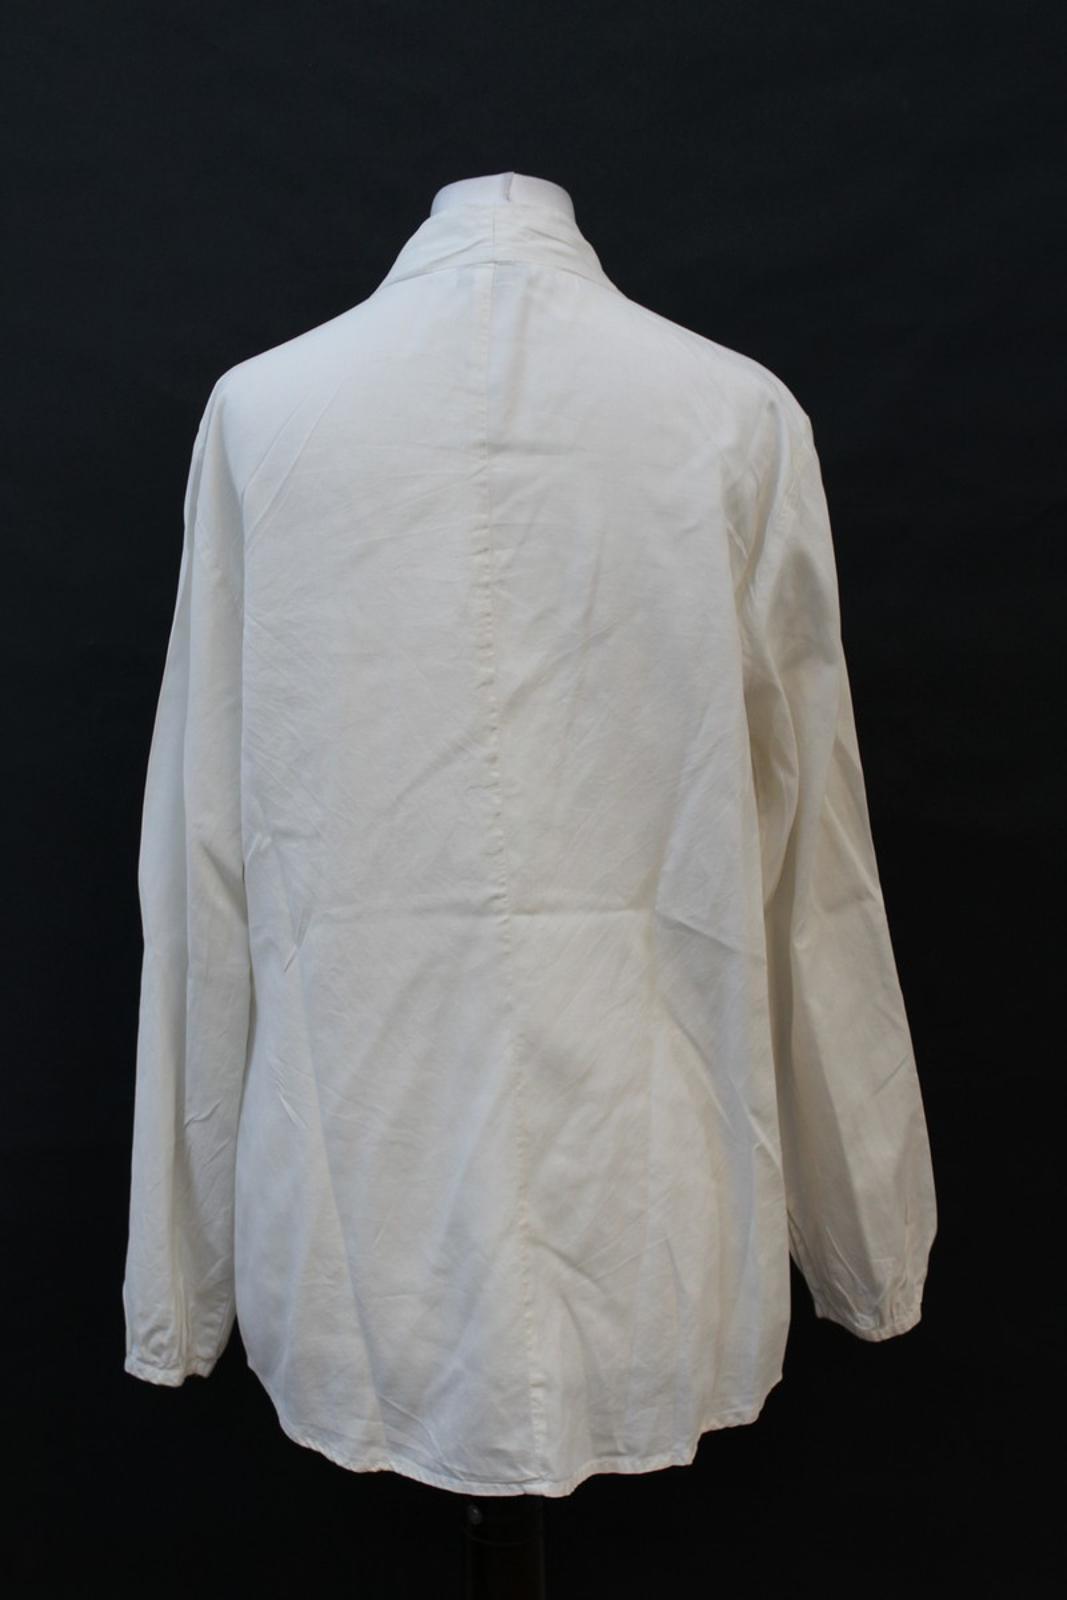 Orvis-Damas-Marfil-Seda-manga-larga-escote-en-forma-de-V-Blusa-Talla-S-UK6-8 miniatura 5